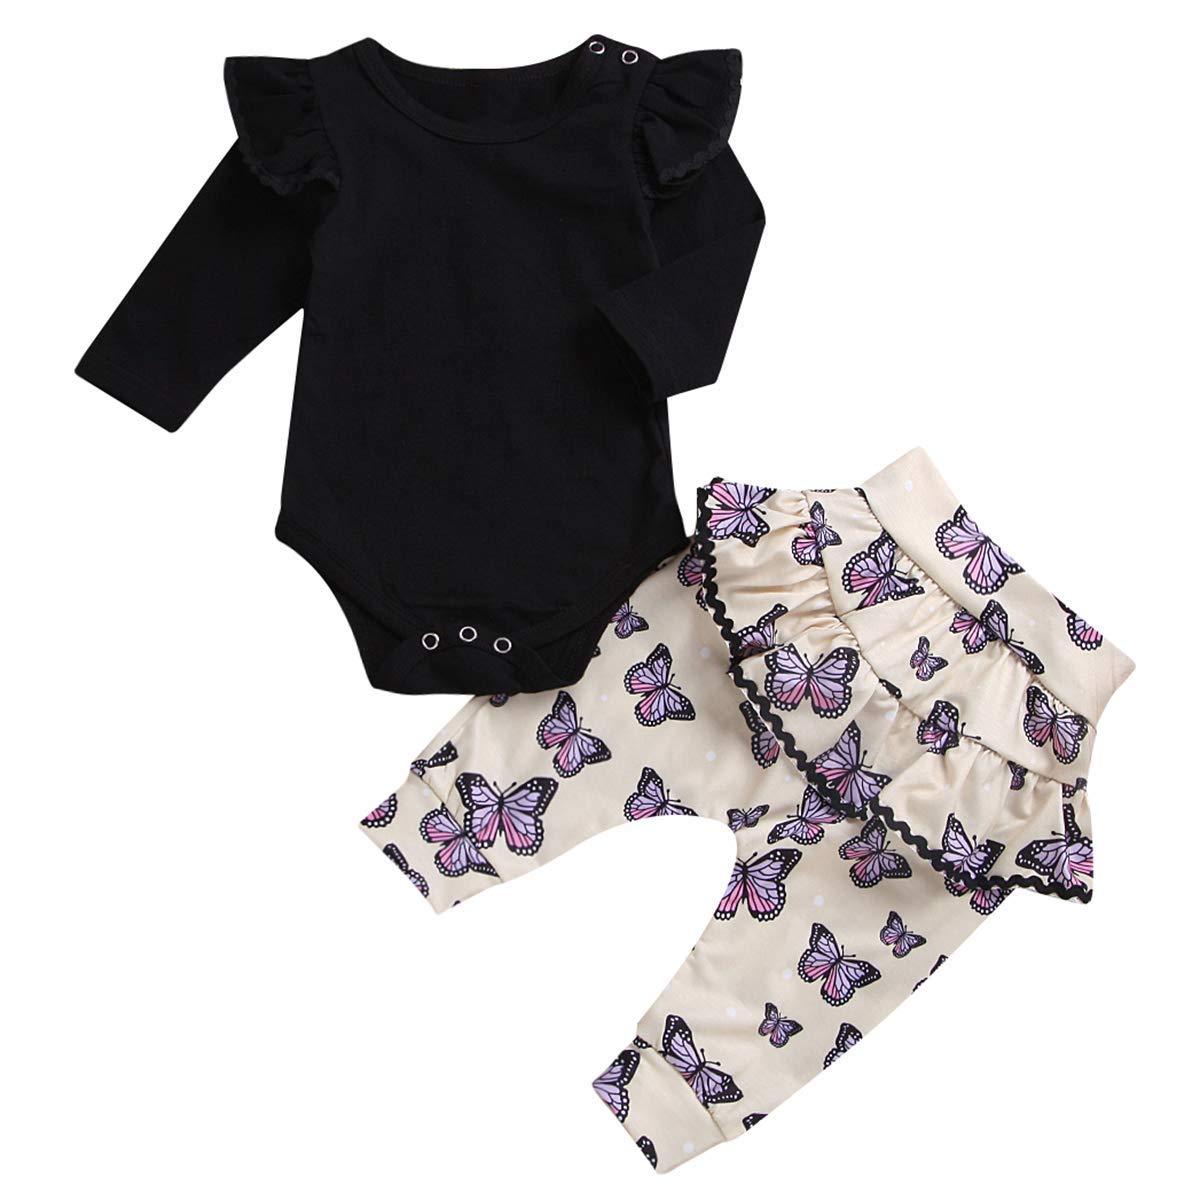 c6b18f148de Get Quotations · Baby Girl Set Cotton Long Sleeve Romper + Ruffle Butterfly  Print Pants 2pcs